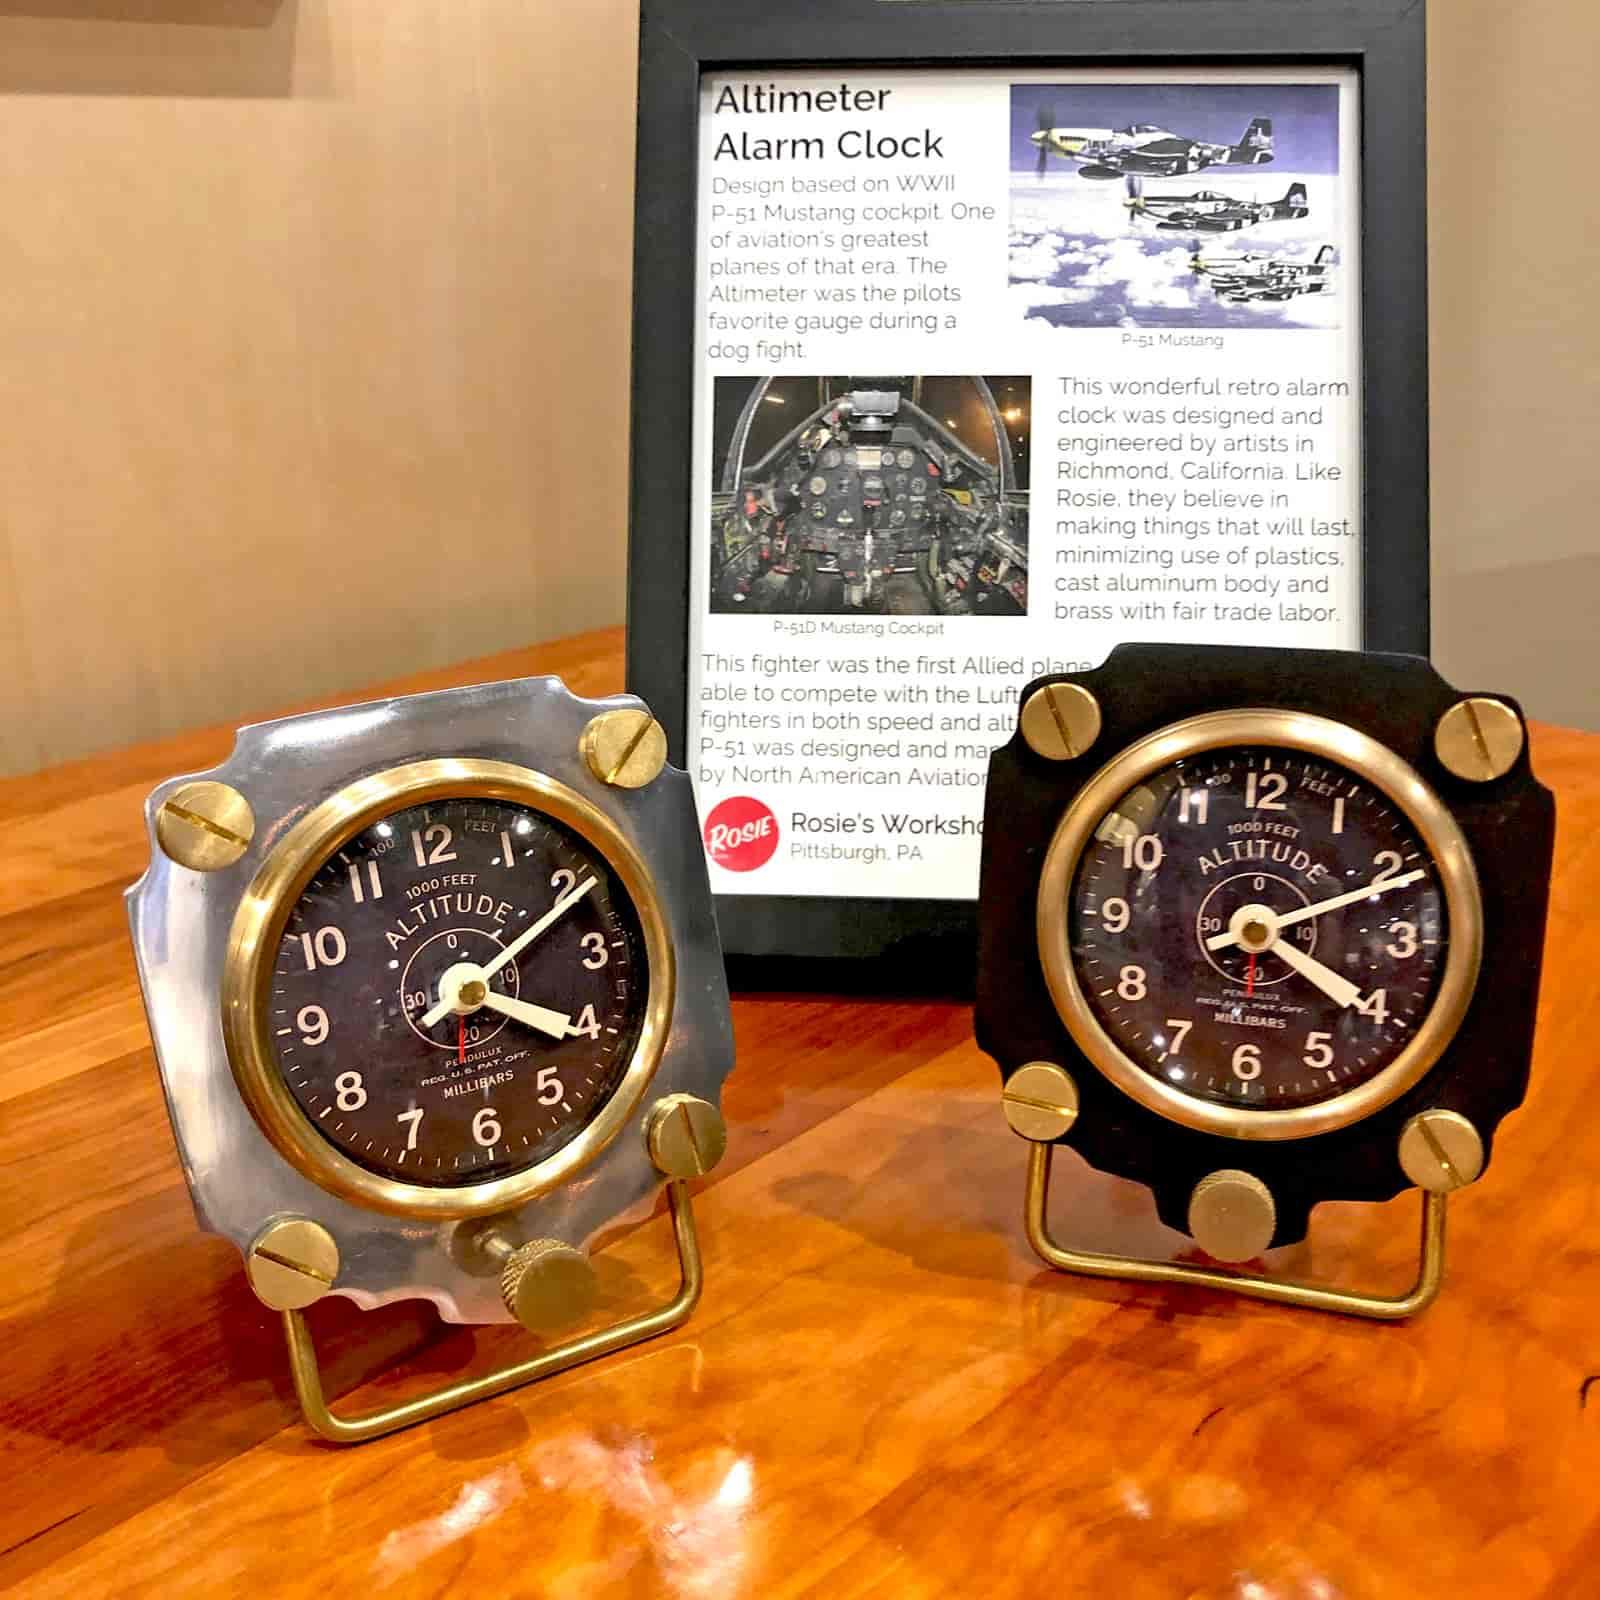 Rosie's Workshop Altimeter Alarm Clocks. A wonderful retro alarm clock design based on altimeters from WWII fighter planes.